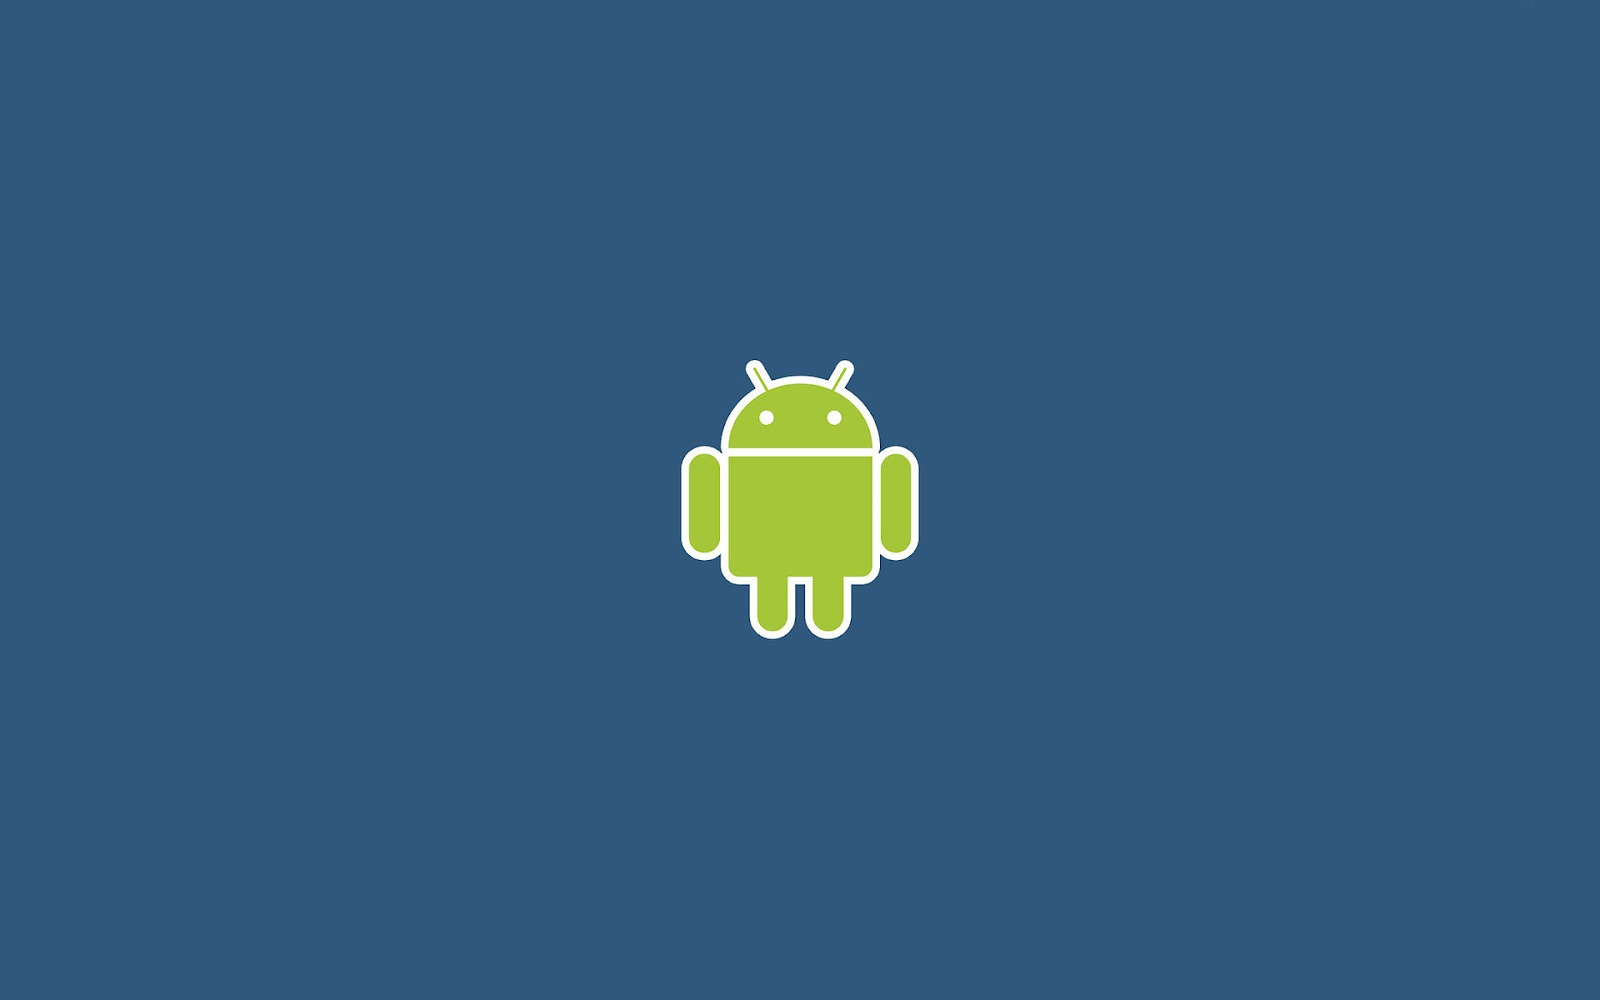 http://2.bp.blogspot.com/-yDohKtcwOXs/UE8sEu_-CnI/AAAAAAAAHTo/CDs5YZ9o2HY/s1600/hd-blauwe-achtergrond-met-groene-android-logo-wallpaper.jpg